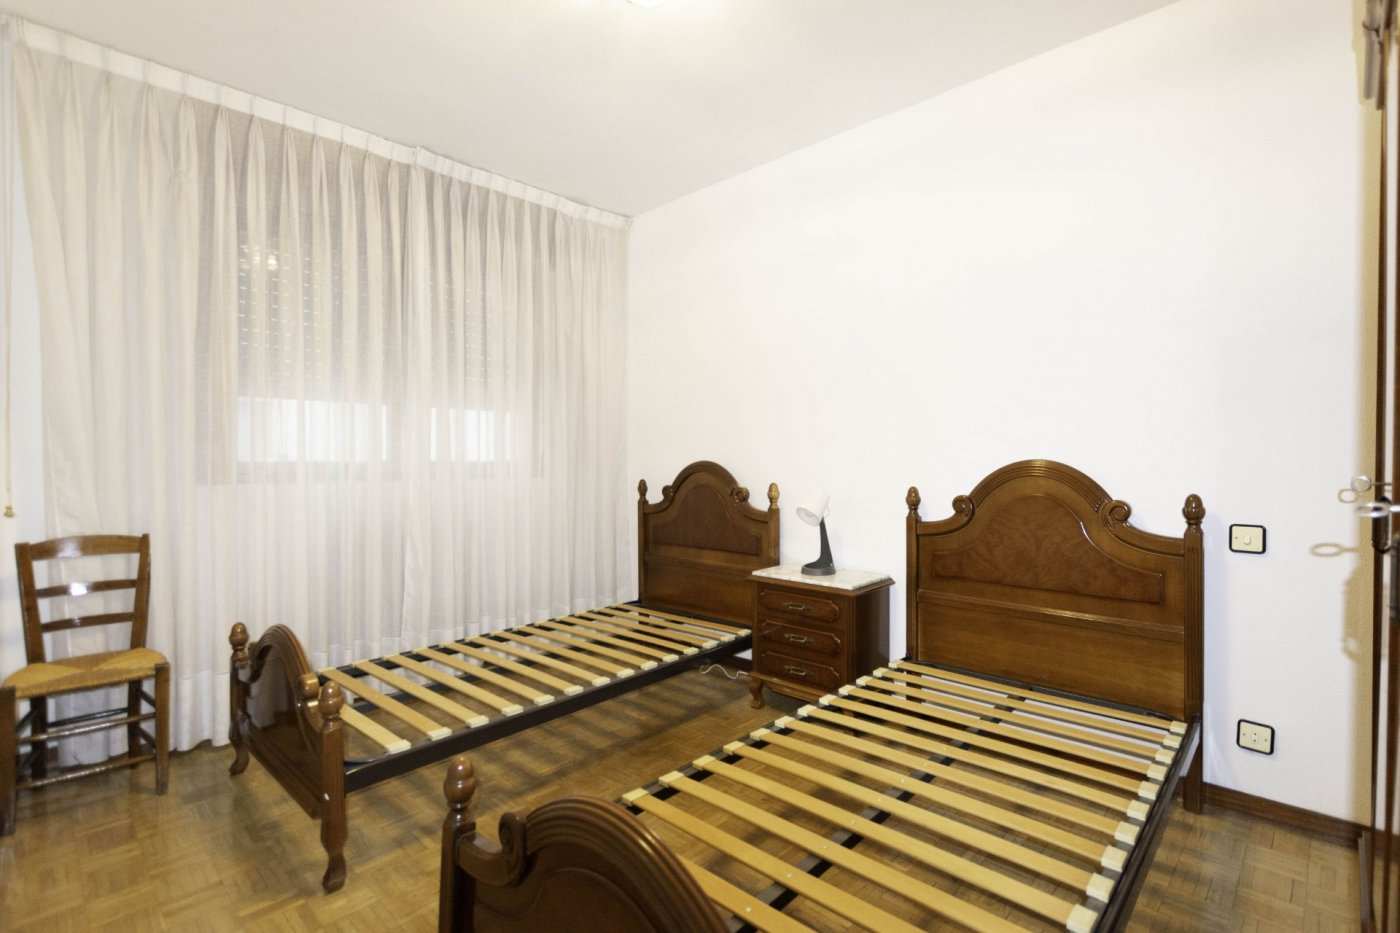 Apartamento en vallobin - imagenInmueble5